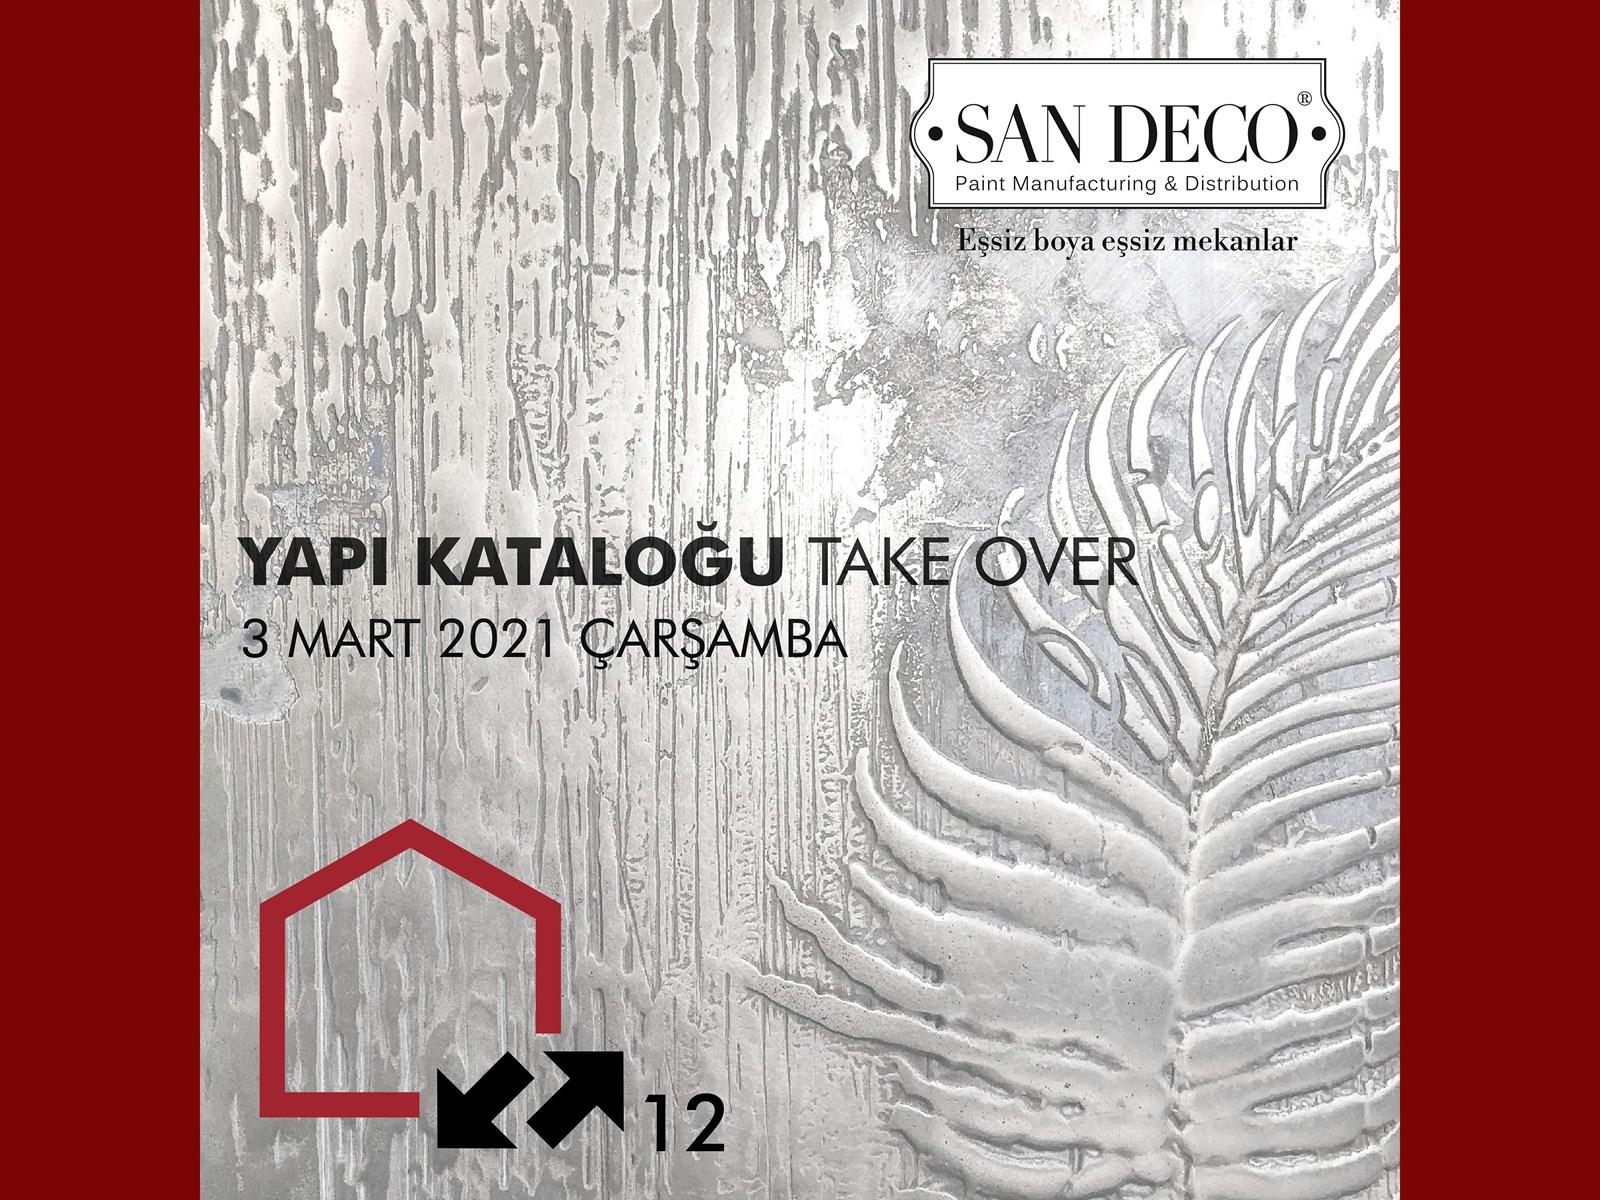 TakeOver #12 - San Deco